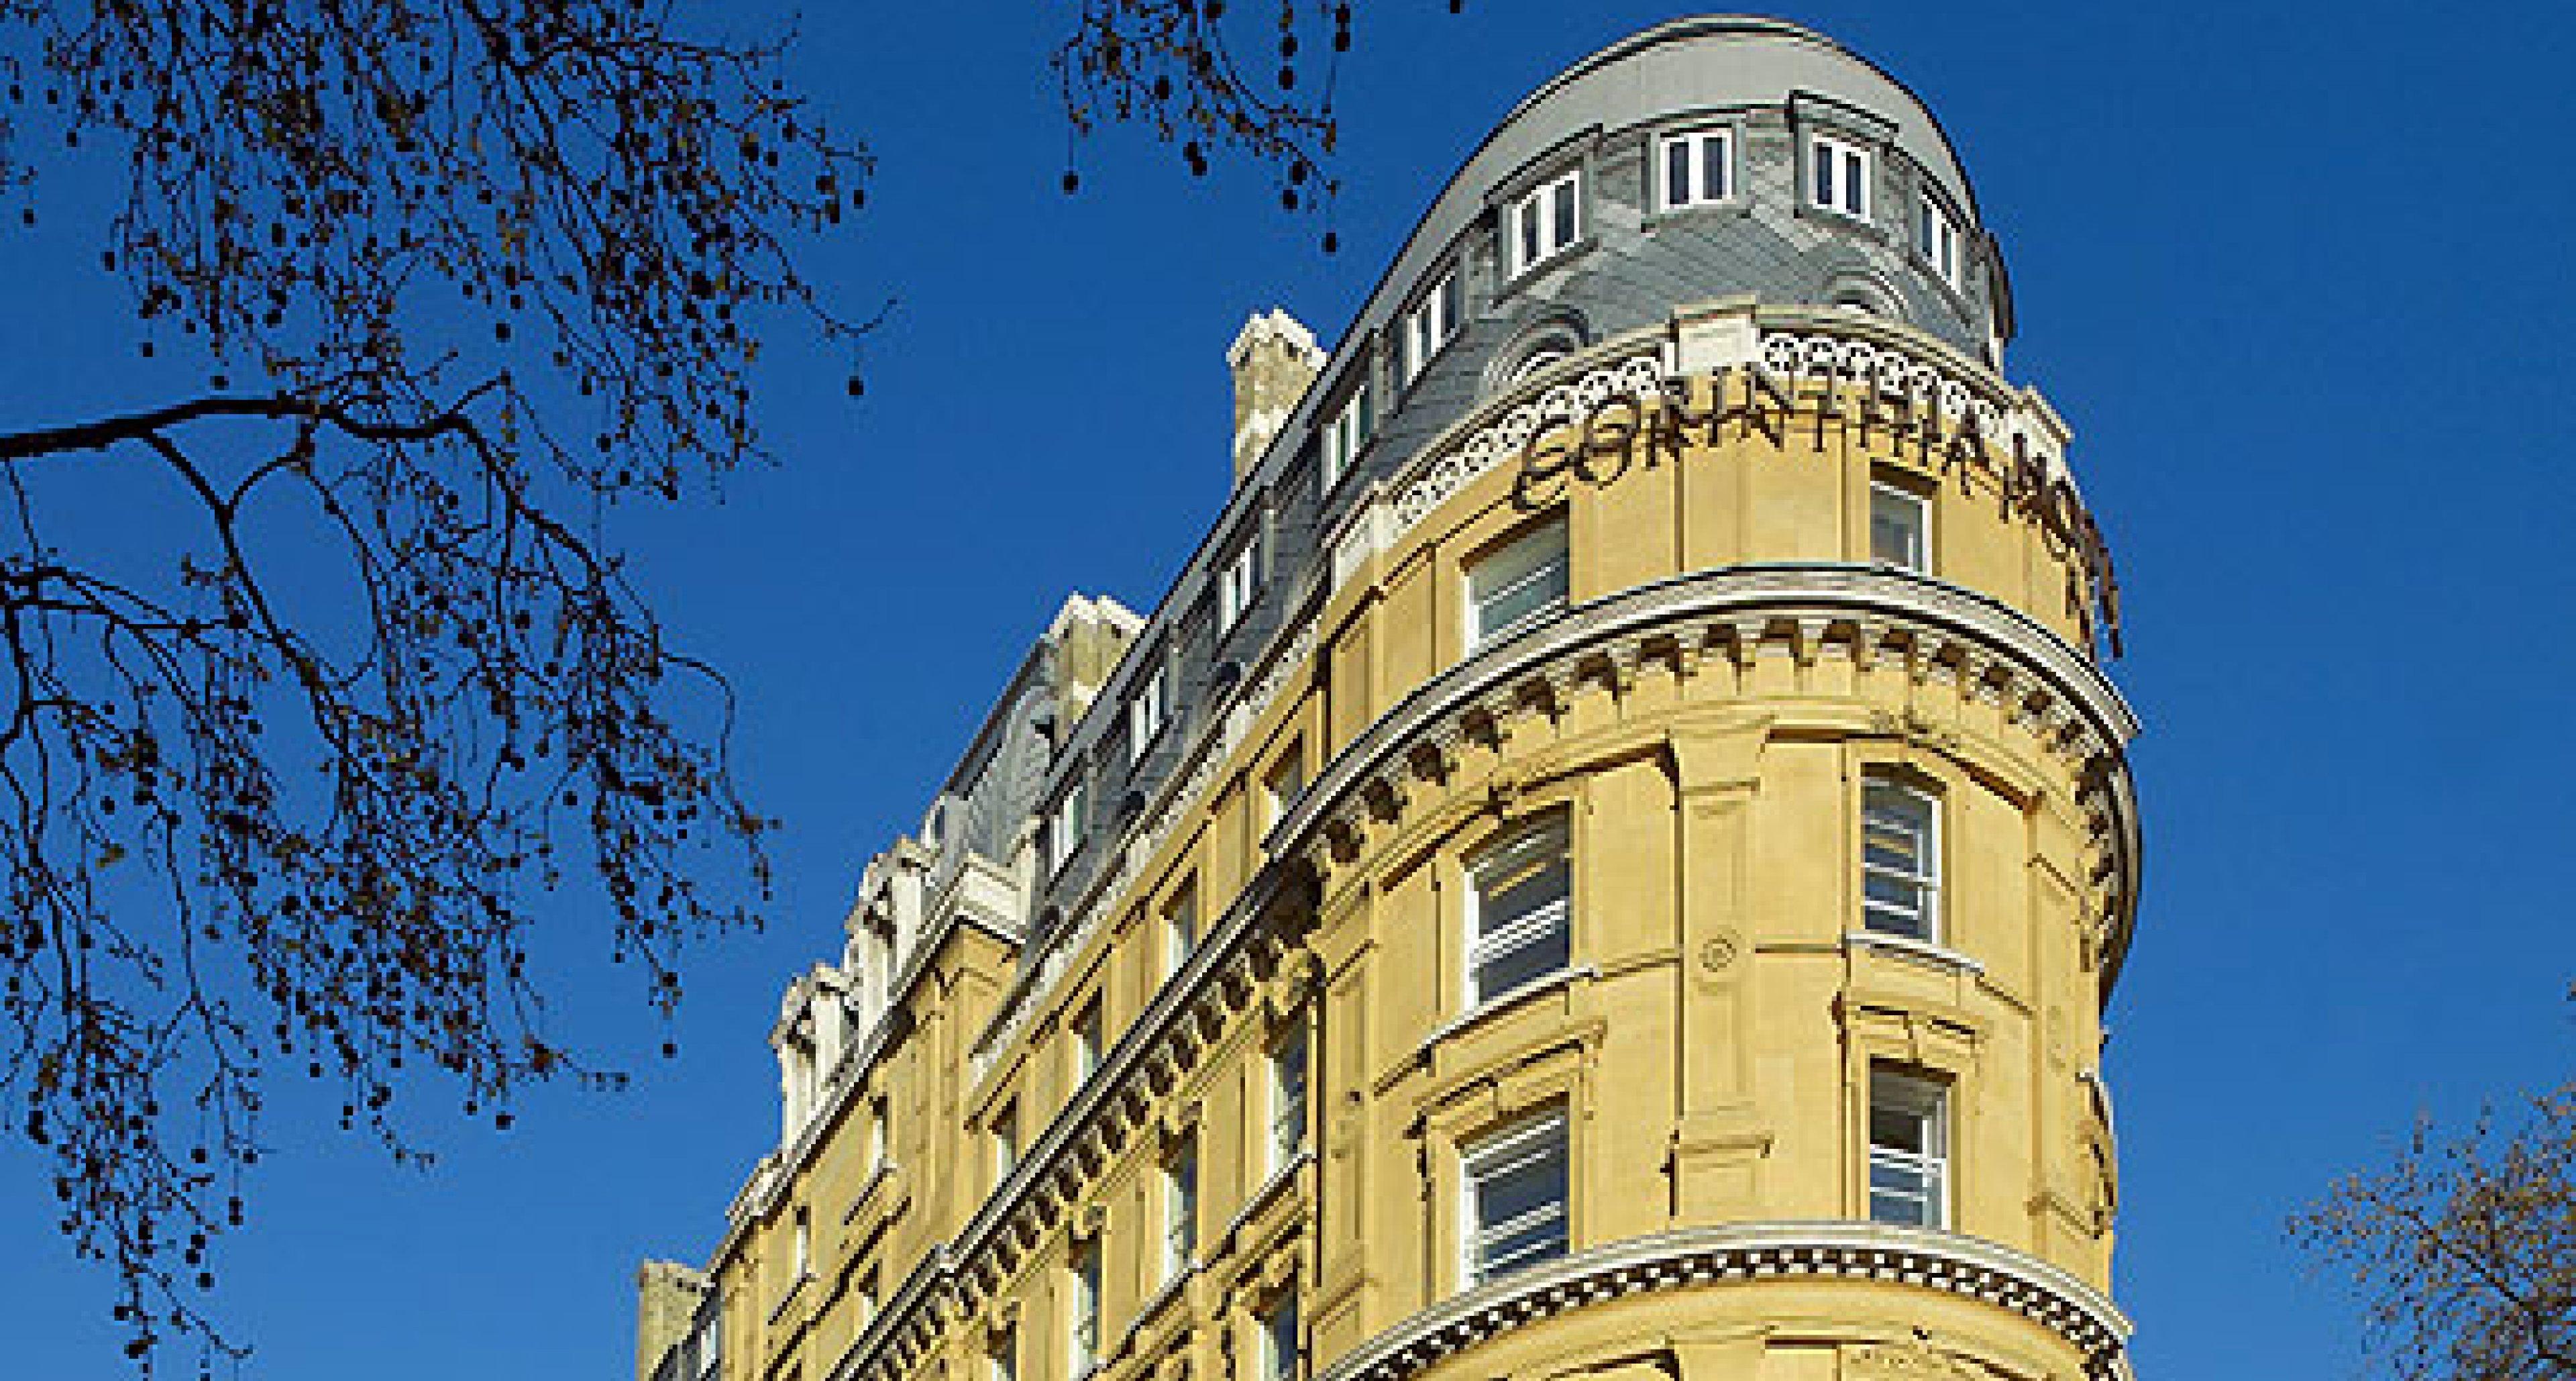 Corinthia Hotel London: Das Prachtministerium